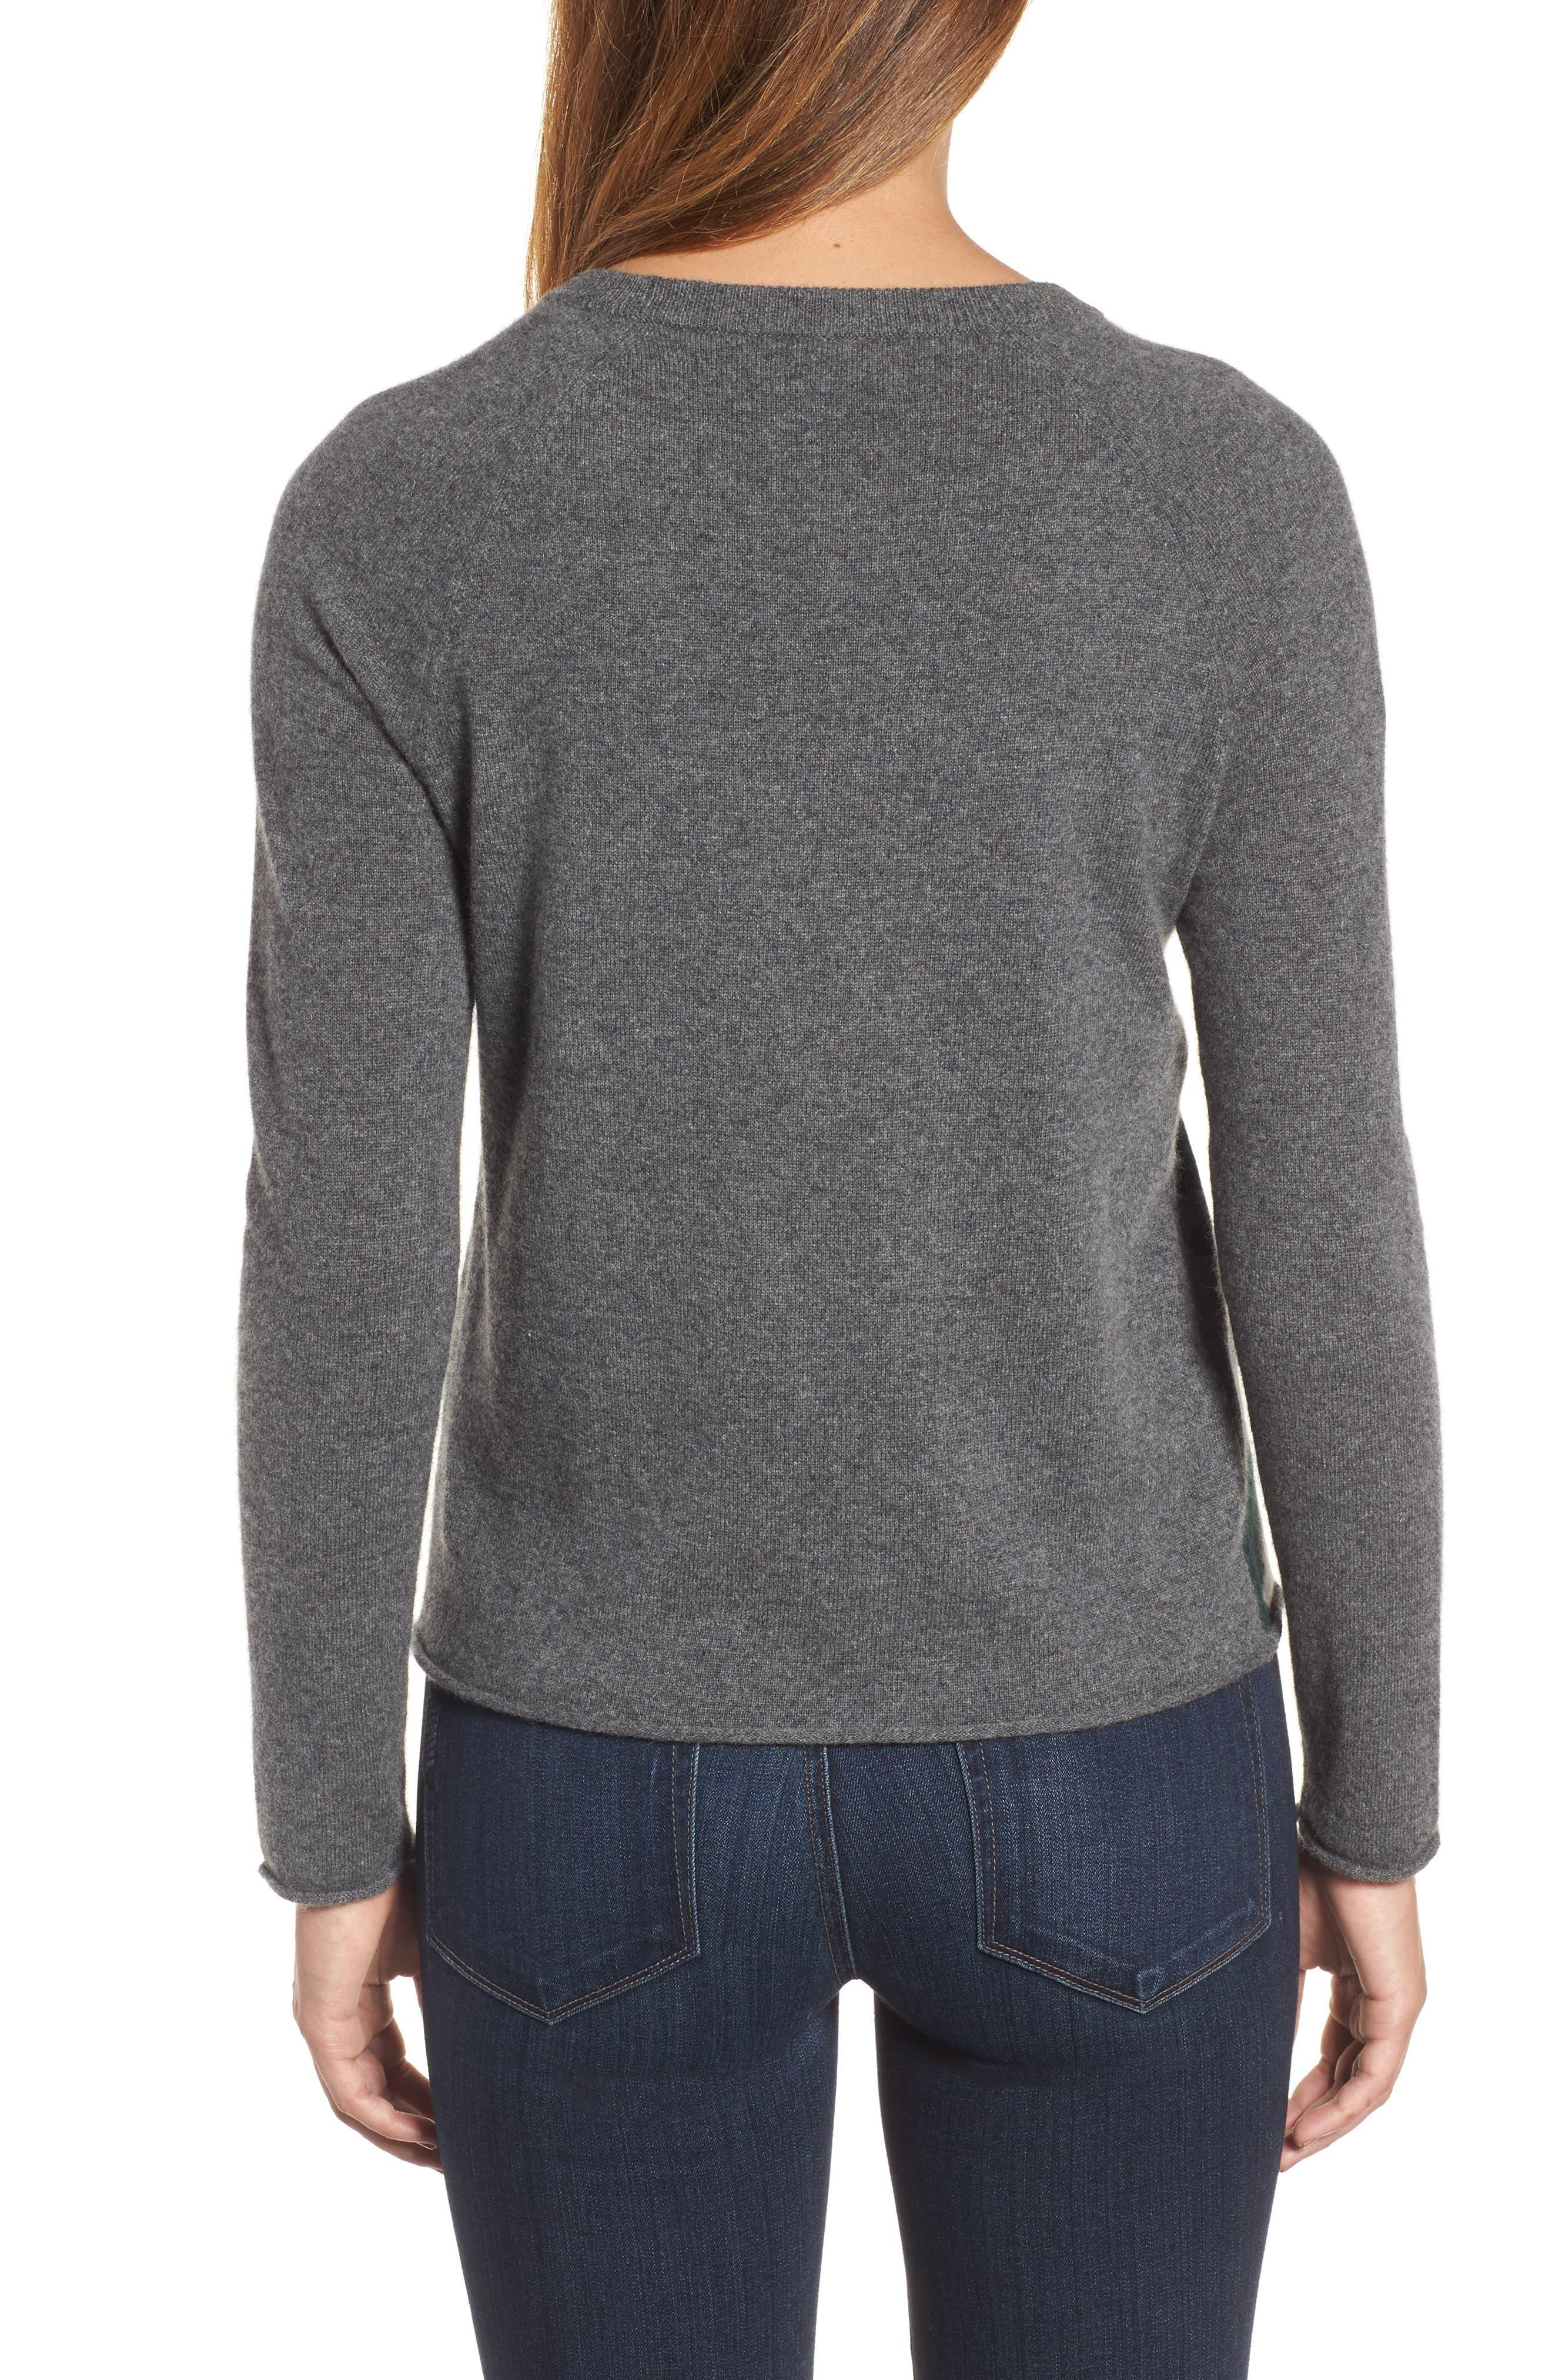 Camo Cashmere Sweater,                             Alternate thumbnail 2, color,                             Multi